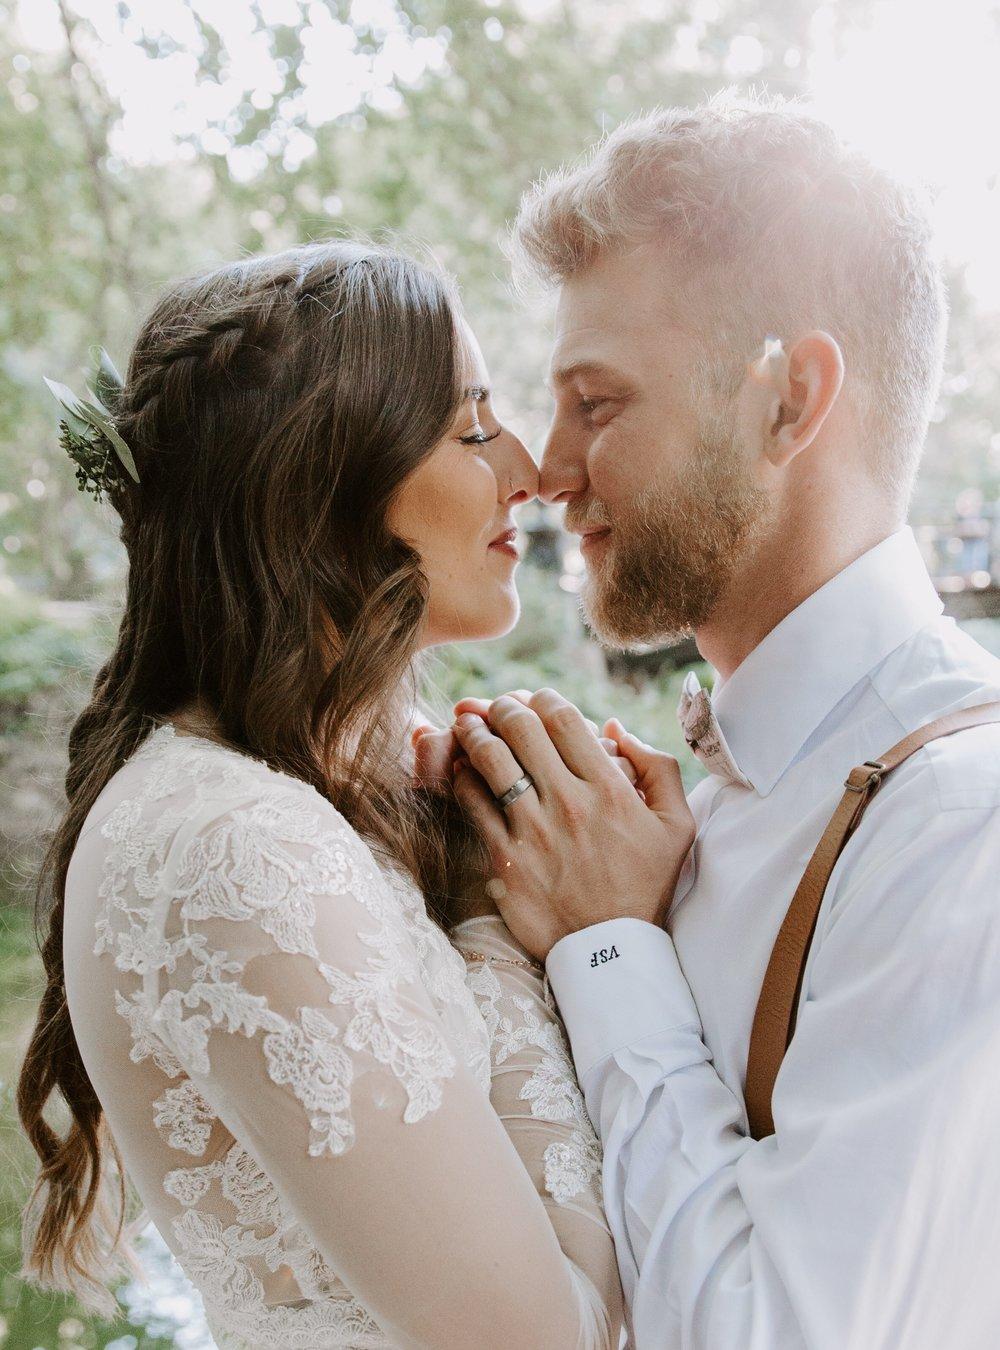 Wedding Day Secrets From Photographers | Abigail Derrick Photography